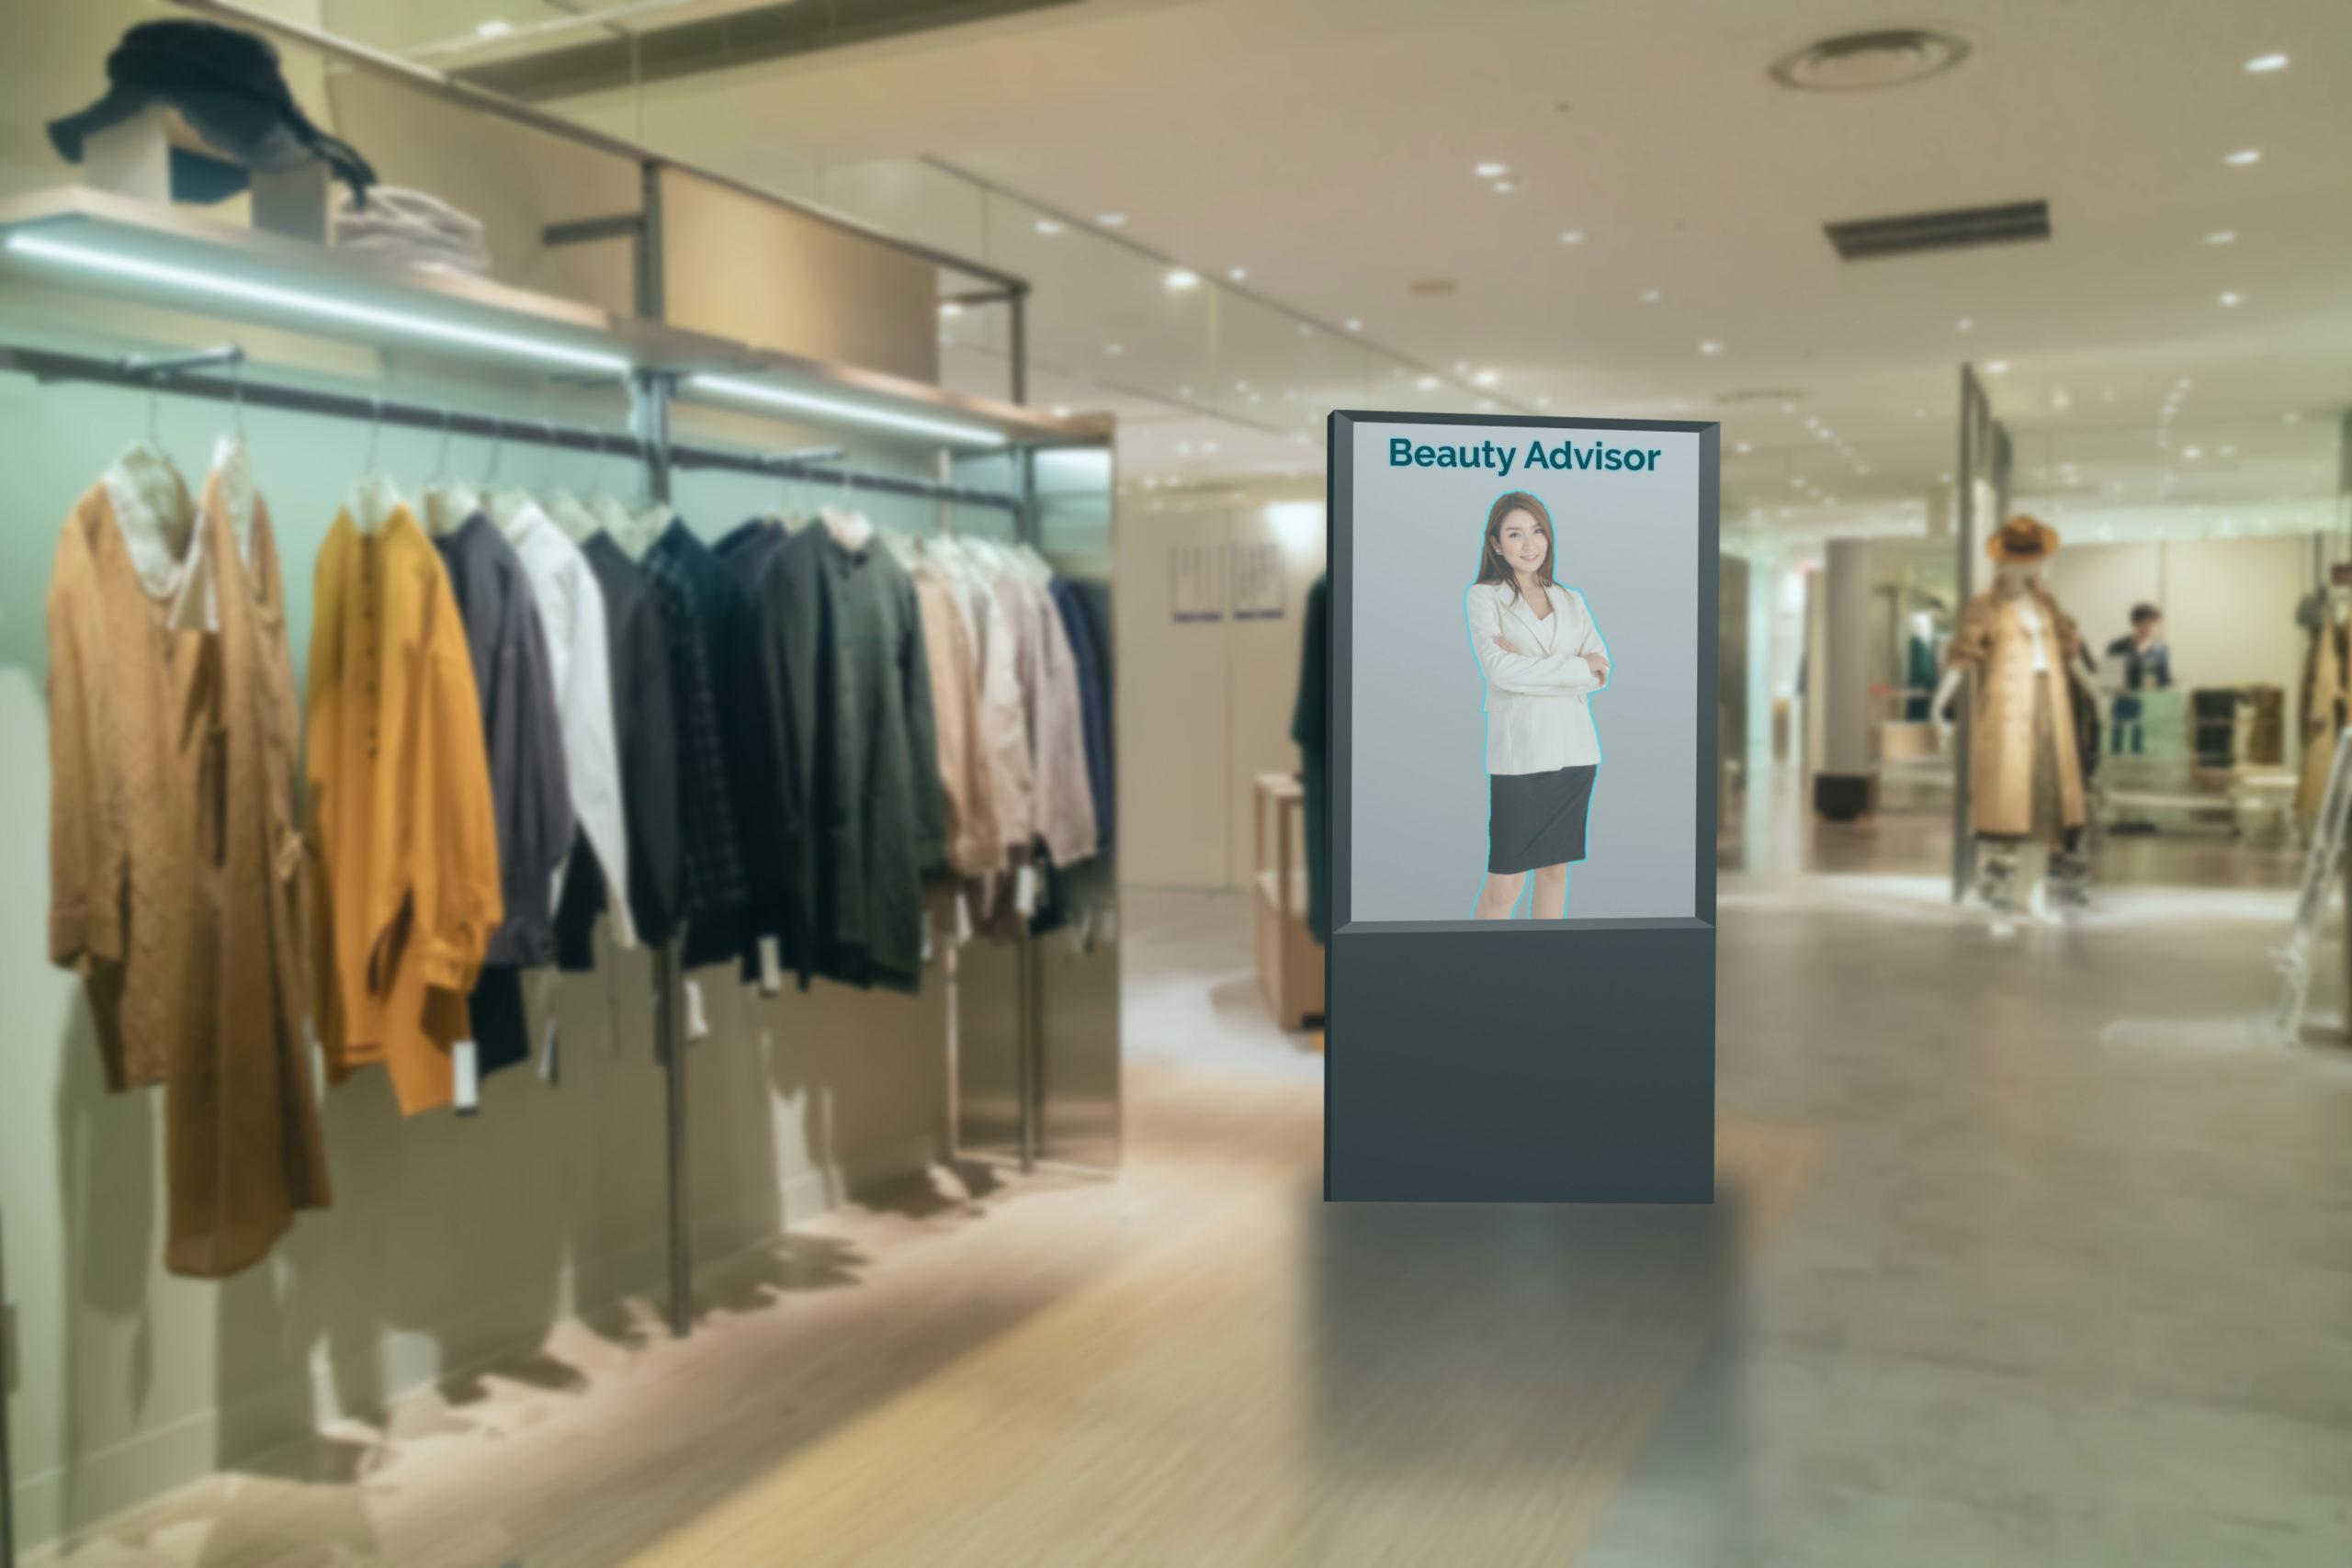 Digital Signage in Verkaufsräumen